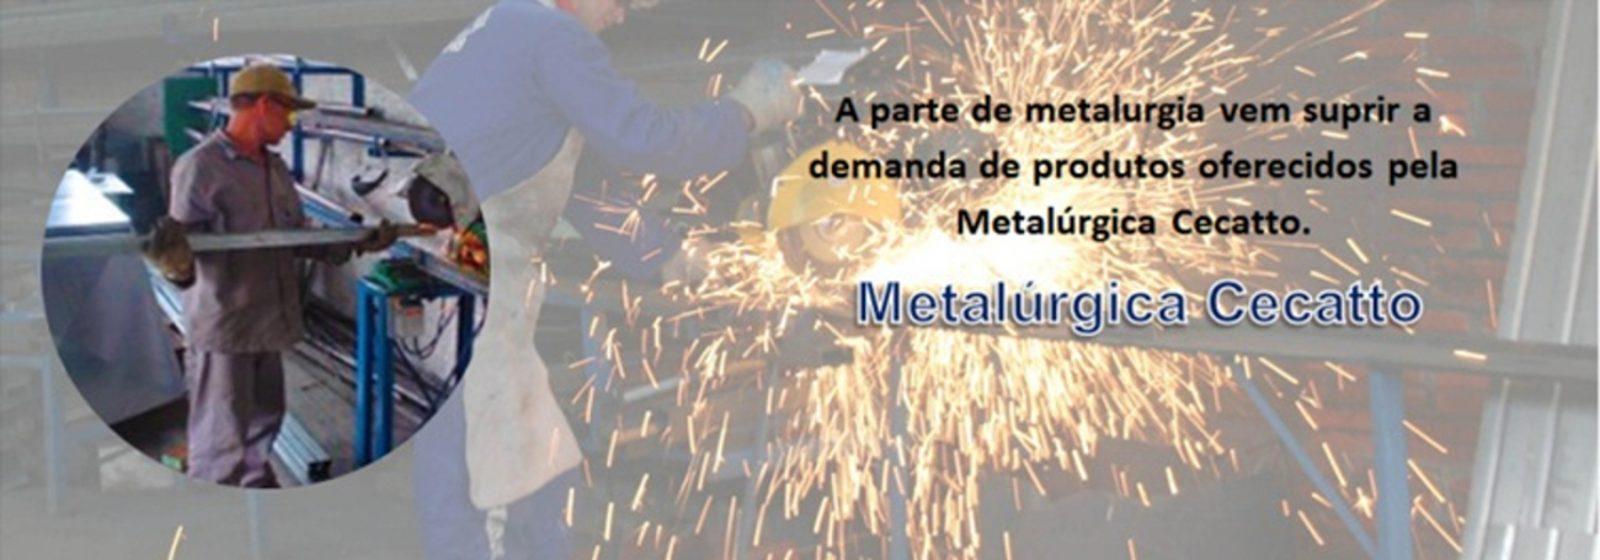 METALÚRGICA CECATTO (41) 3245-2771 EM CURITIBA LIXEIRAS E CONTAINERS EM CURITIBA LIXEIRA DE TAMBORES EM CURITIBA FABRICANTE DE LIXEIRAS PLÁSTICAS COLETA SELETIVA LIXEIRAS EM INOX METALÚRGICA PORTÕES CURITIBA LIXEIRAS DE TAMBORES E BOMBONAS METALÚGICA DE PORTÕES GRADES E CHURRASQUEIRAS EM CURITIBA LIXEIRA EM INOX BASCULANTE COM PEDAL METALÚRGICA SOLDAS ESPECIAIS CHURRASQUEIRAS E GRELHAS FORNOS DE TAMBORES E LATÃO CONTATO METALURGICA CIC PREÇO CARRINHOS SUPERMERCADO ORÇAMENTO LIXEIRAS PARA CONDOMÍNIOS